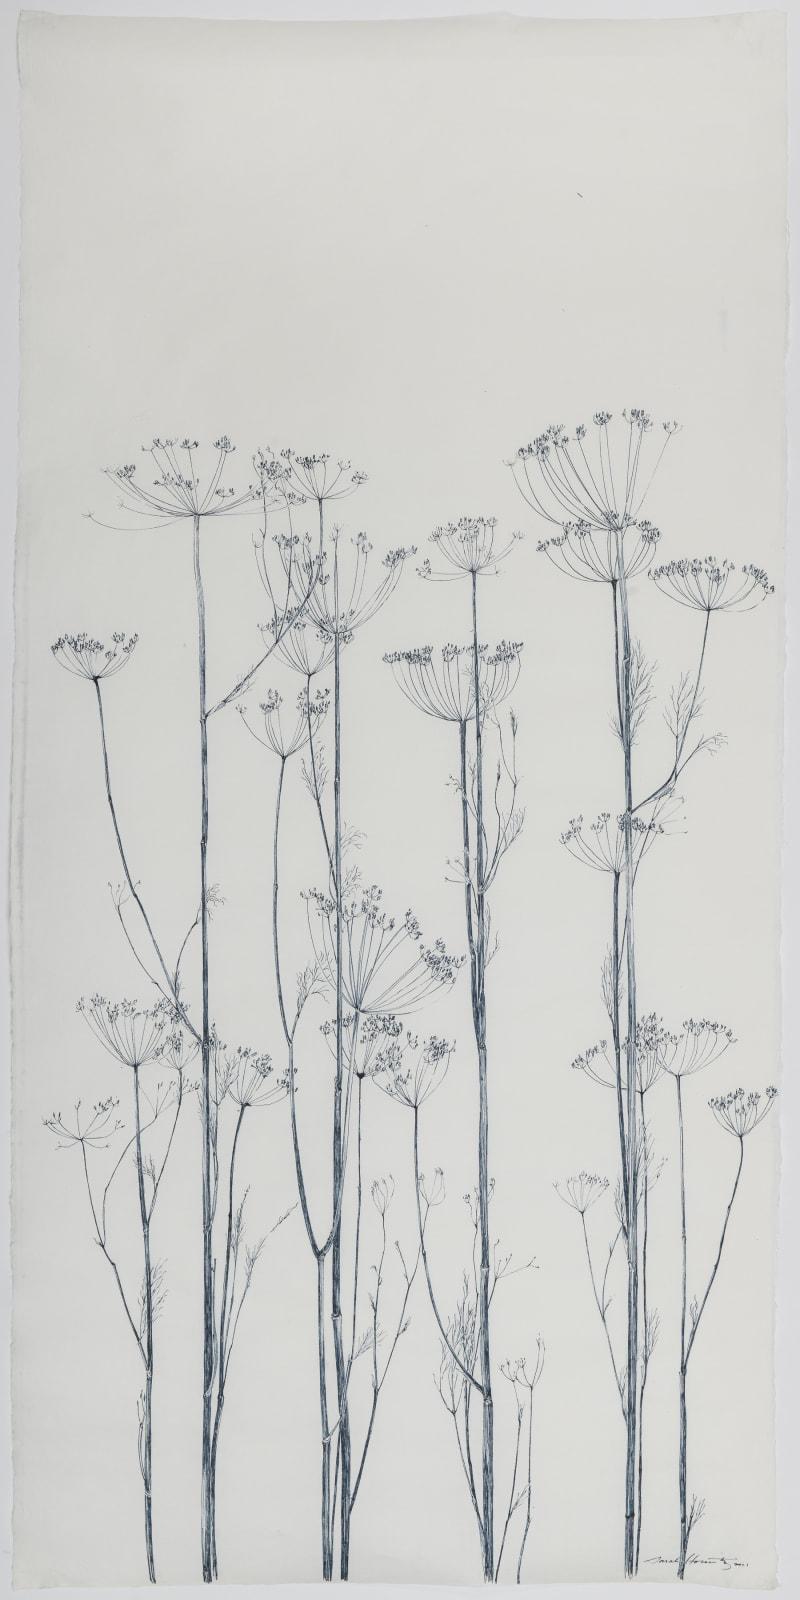 Sarah Horowitz, Seed Heads, 2021